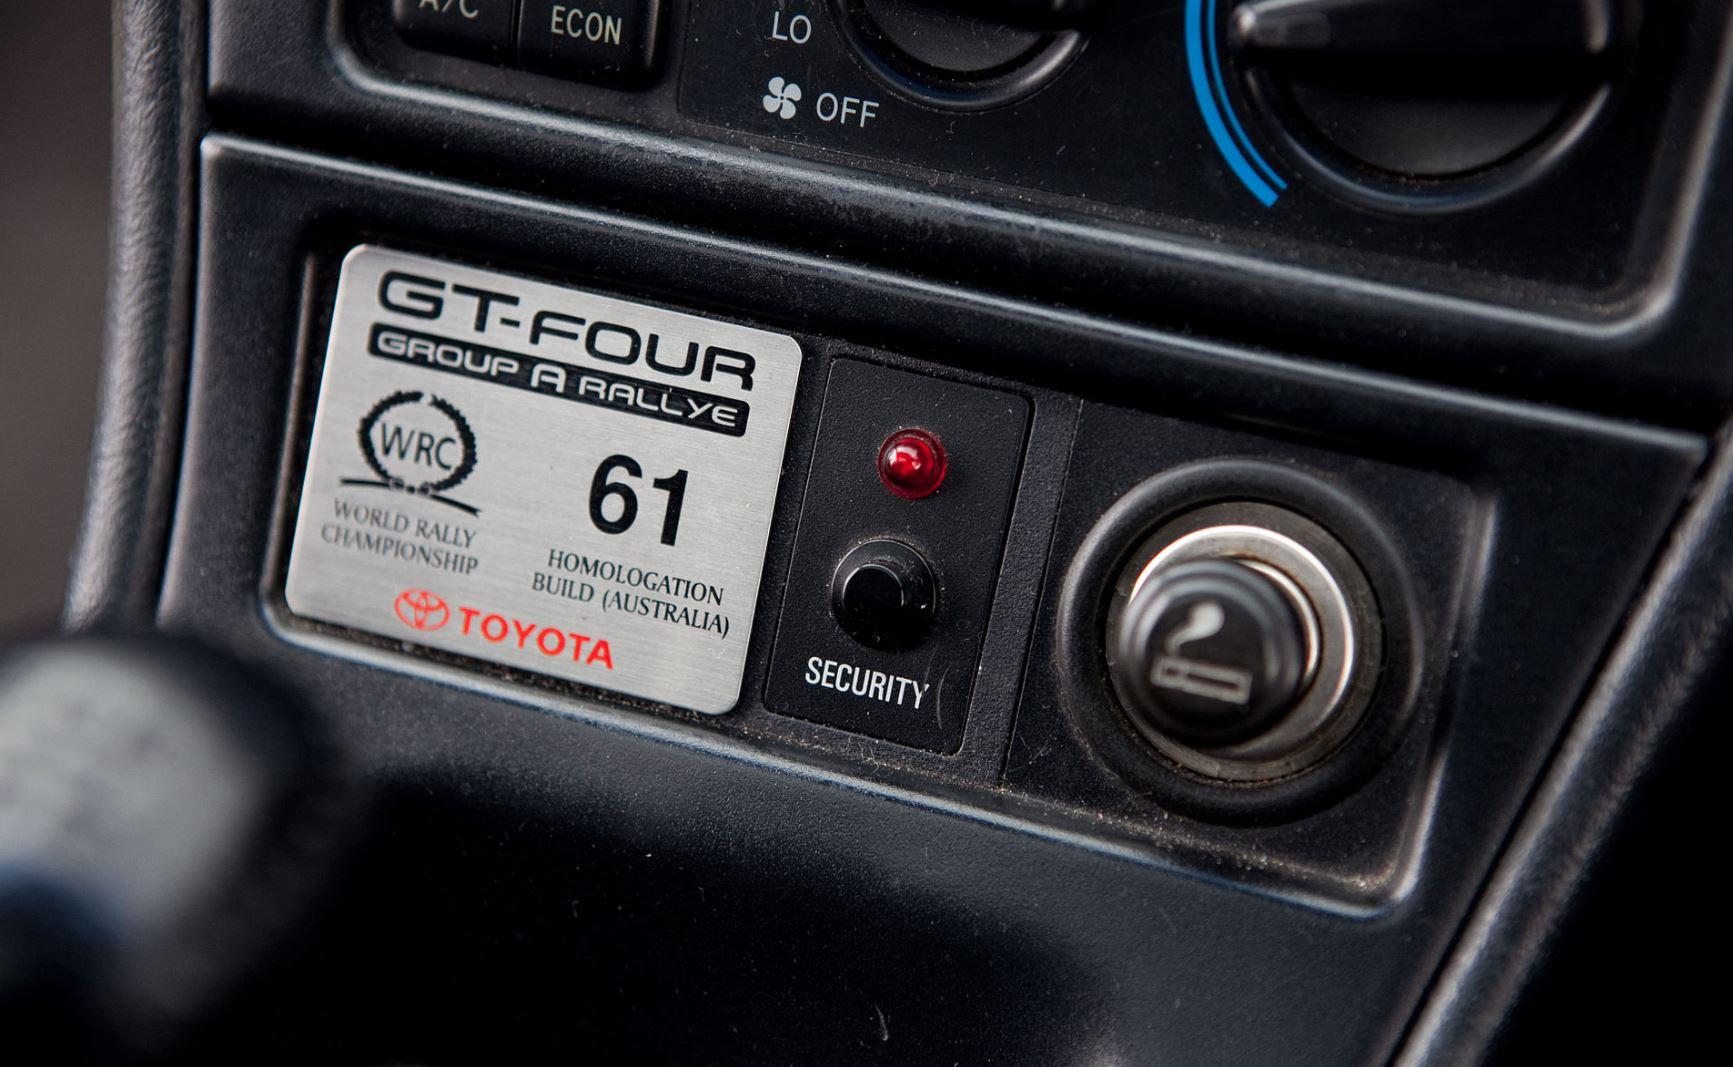 MR2 Bush CELICA GT4 TOYOTA gearshift portant gearbox